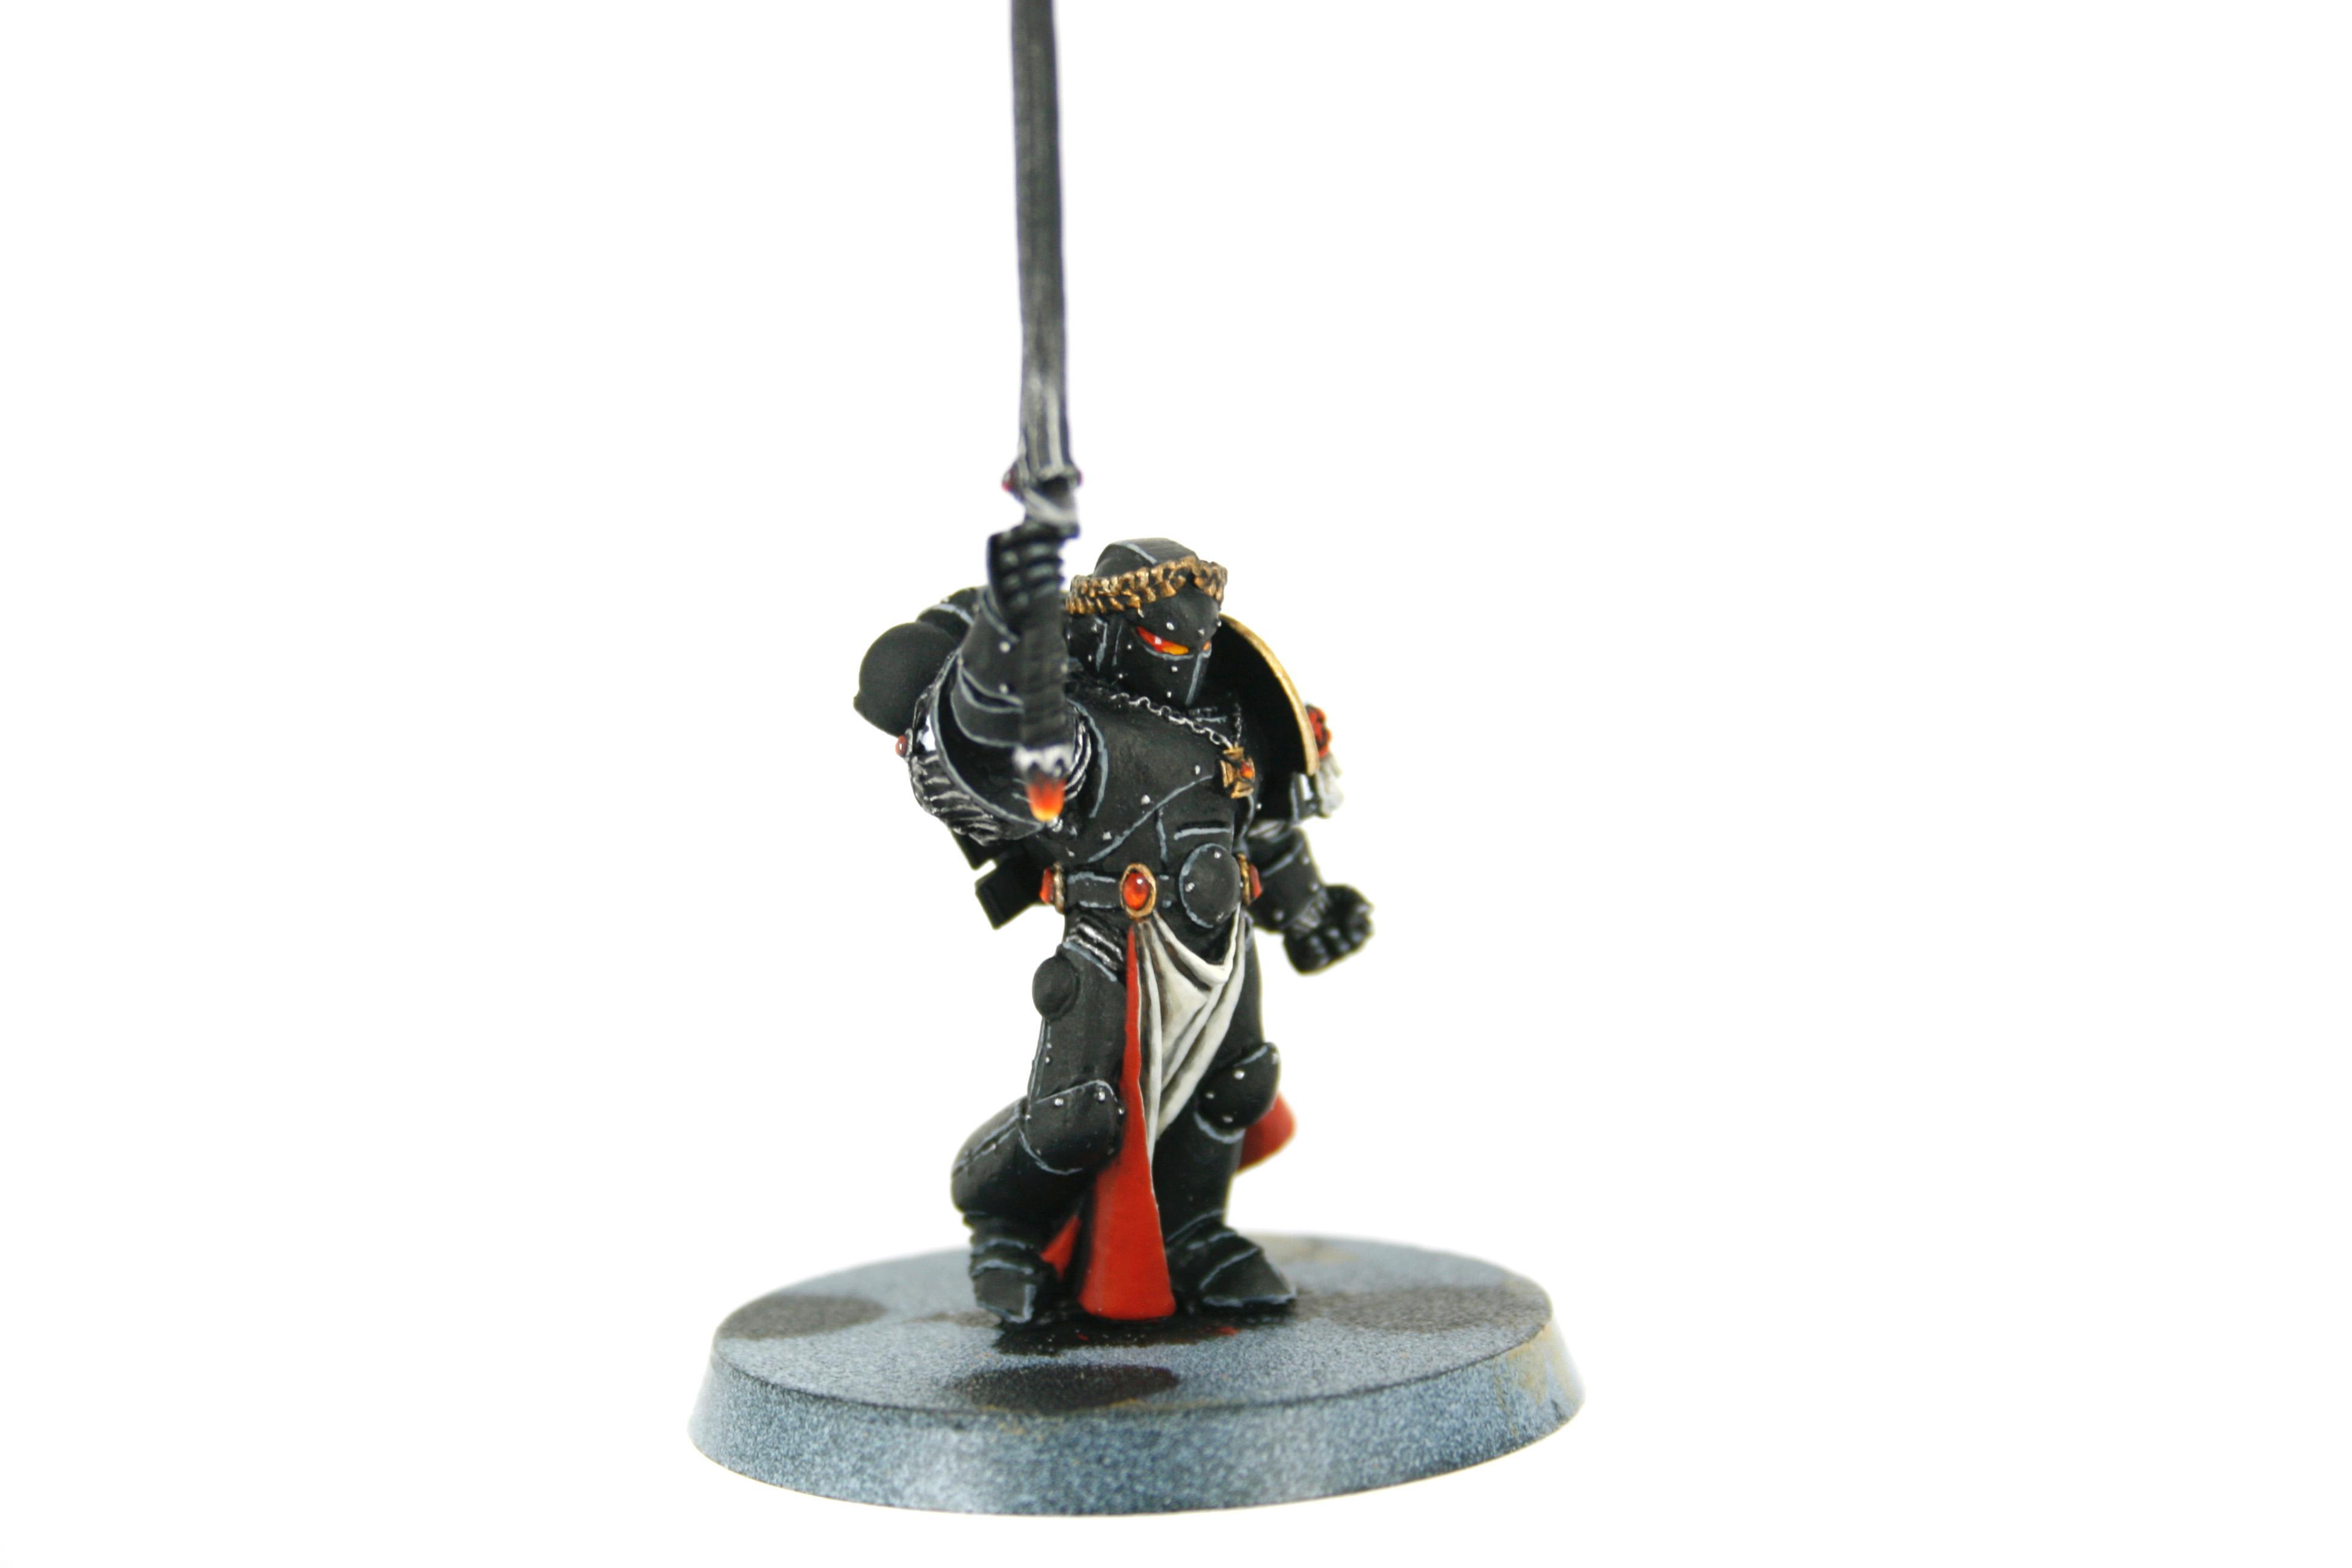 Black Templars, Emperor's Champion, Space Marines, Warhammer 40,000